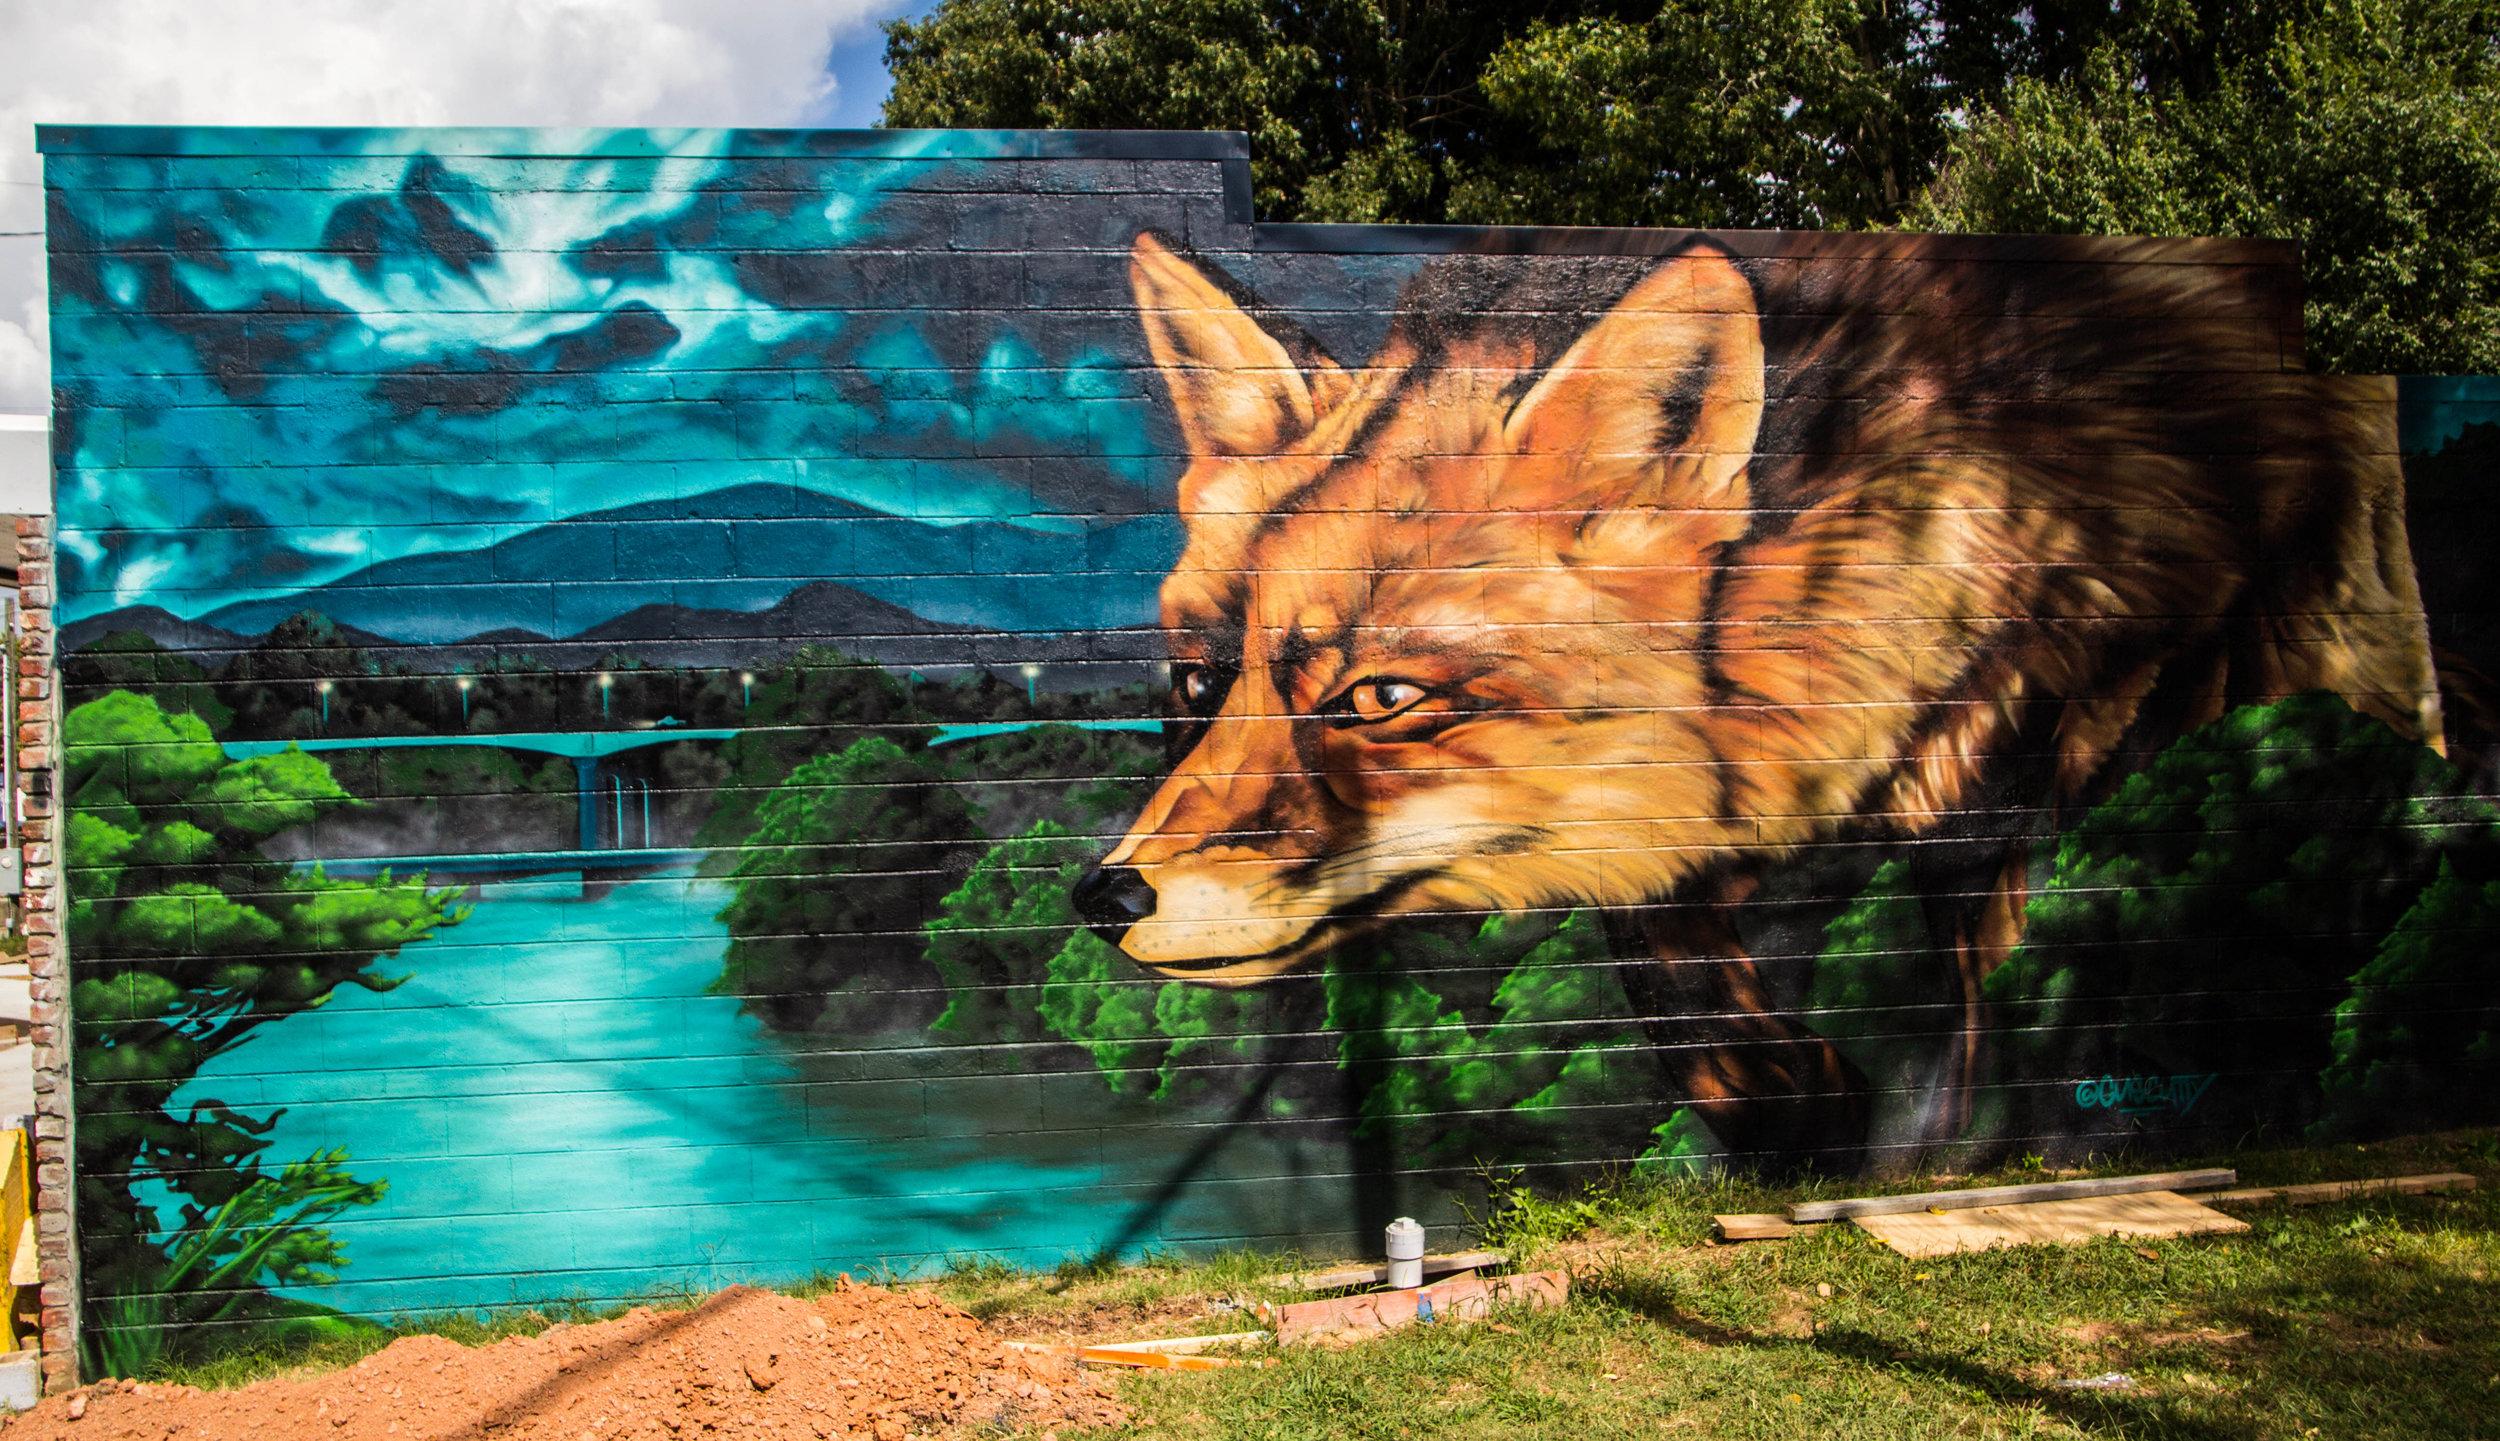 street-art-asheville-north-carolina-32.jpg